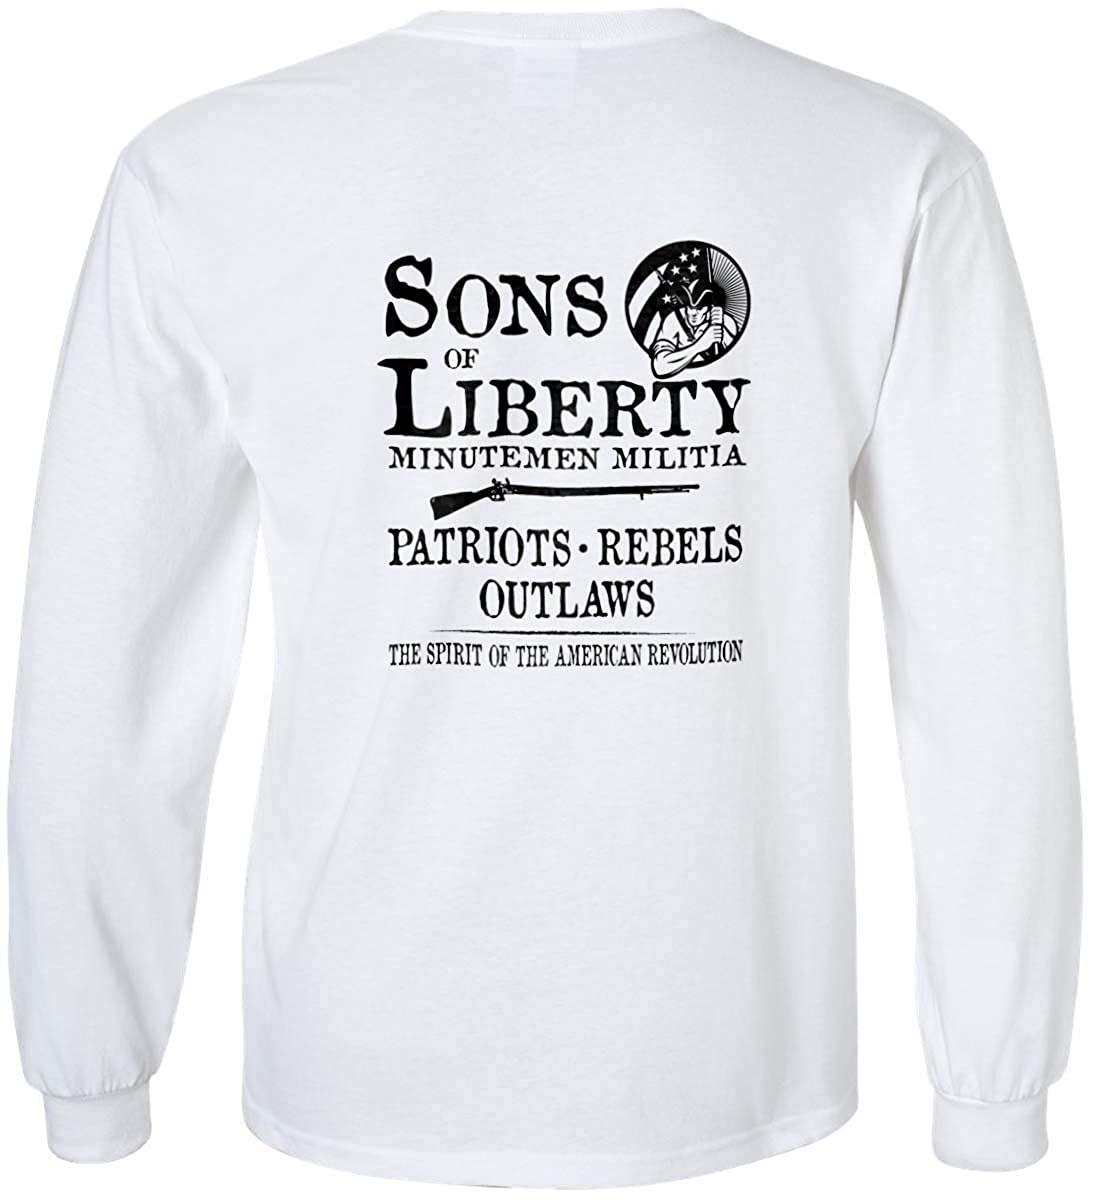 Sons Of Liberty Minuteman Militia Outlaws Sons Long Sleev. Rebels Patriots